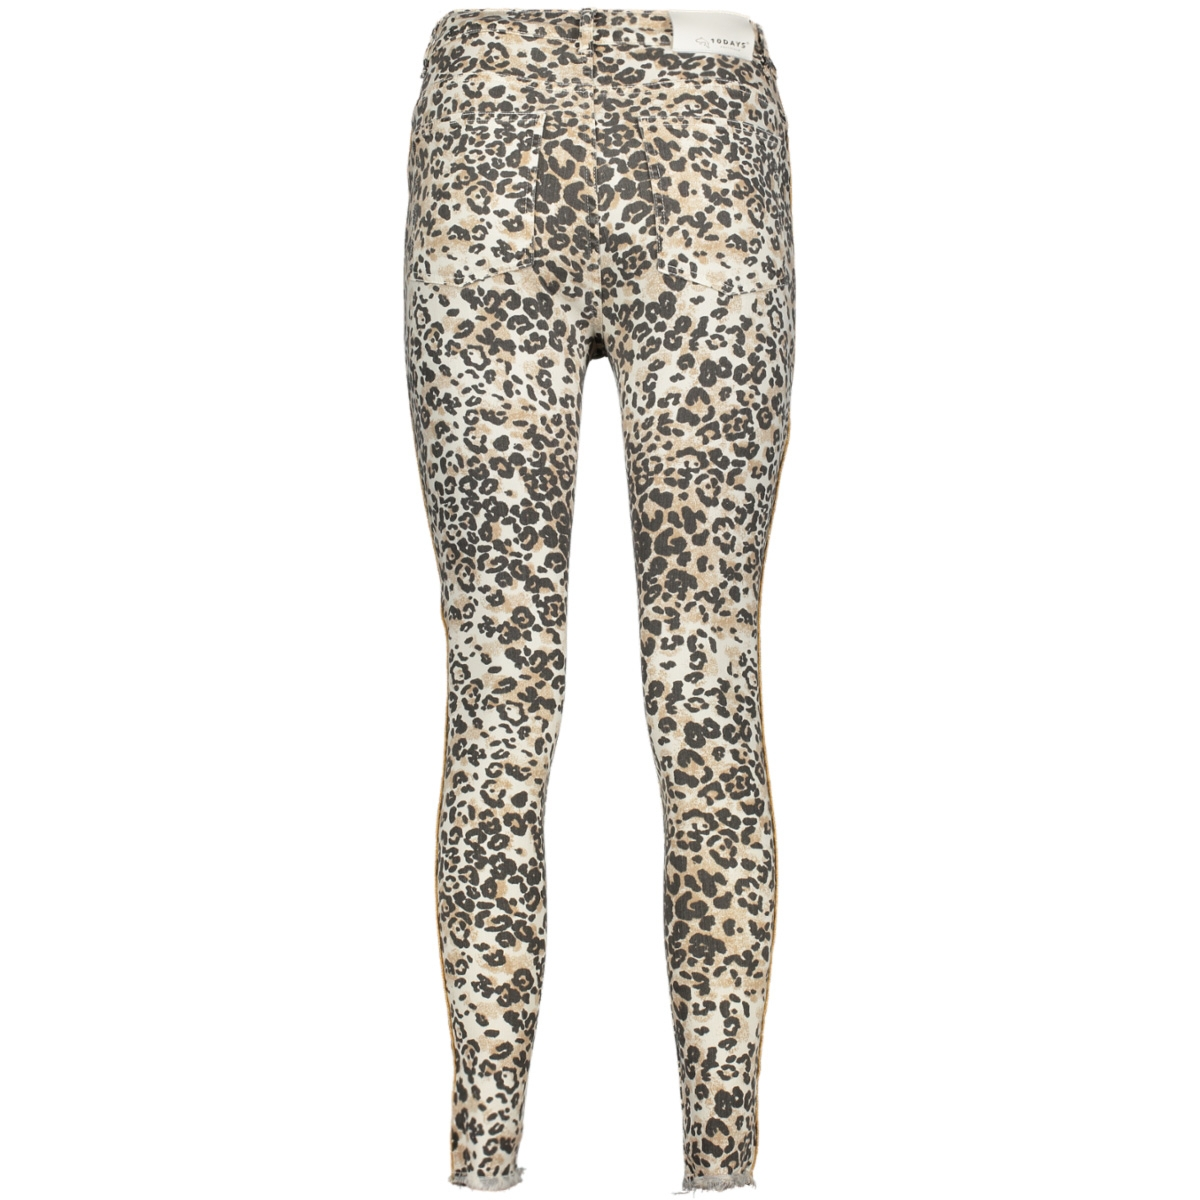 skinny denim 20 063 0203 10 days jeans 1043 winter white